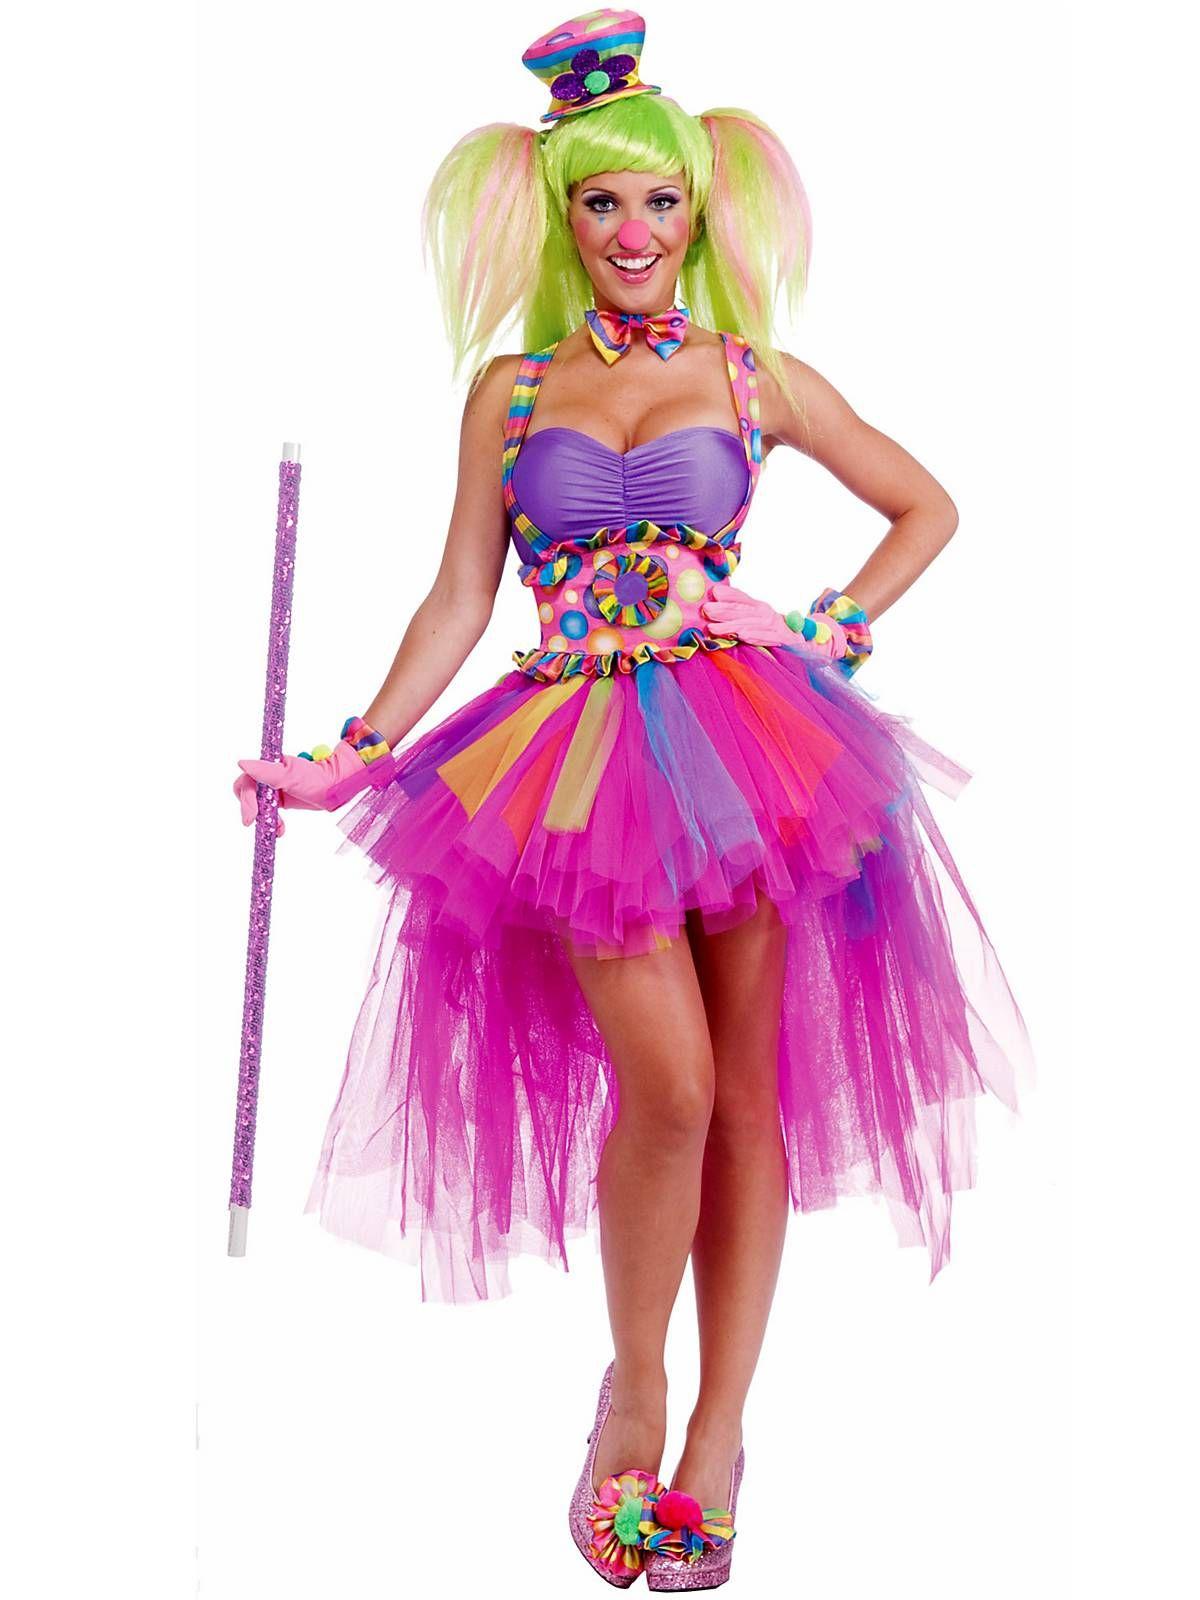 76ada196440d9 Sexy Tutu Lulu the Clown Costume   Wholesale Clown Costumes for Adults